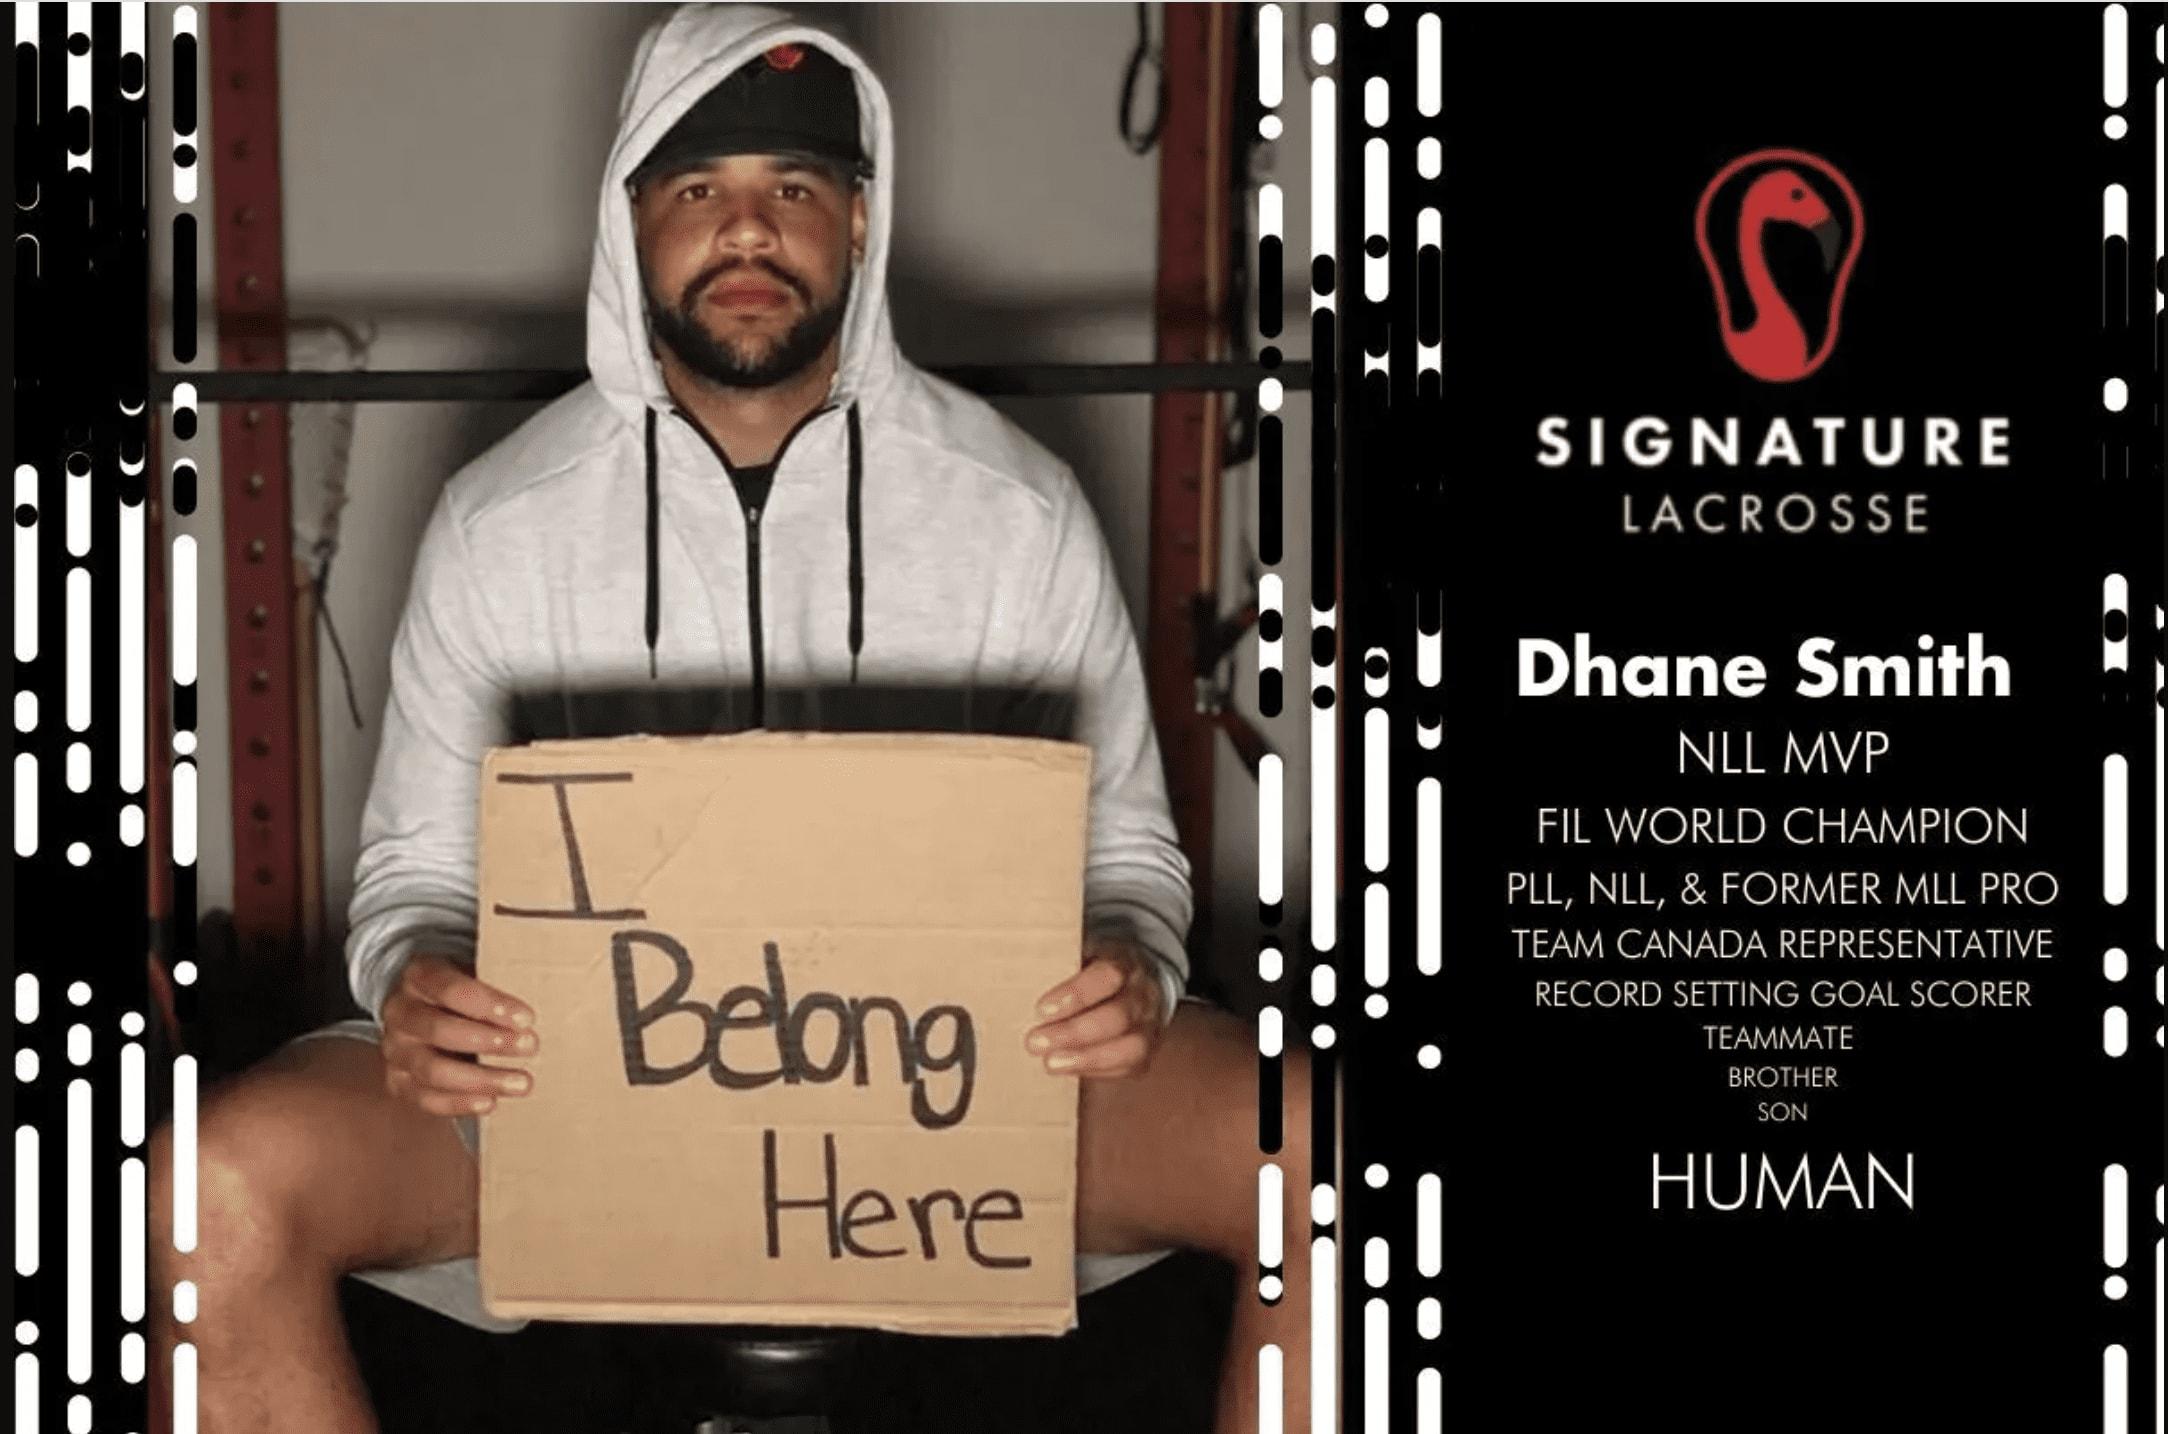 'I Belong Here' Says Dhane Smith, First Black NLL MVP